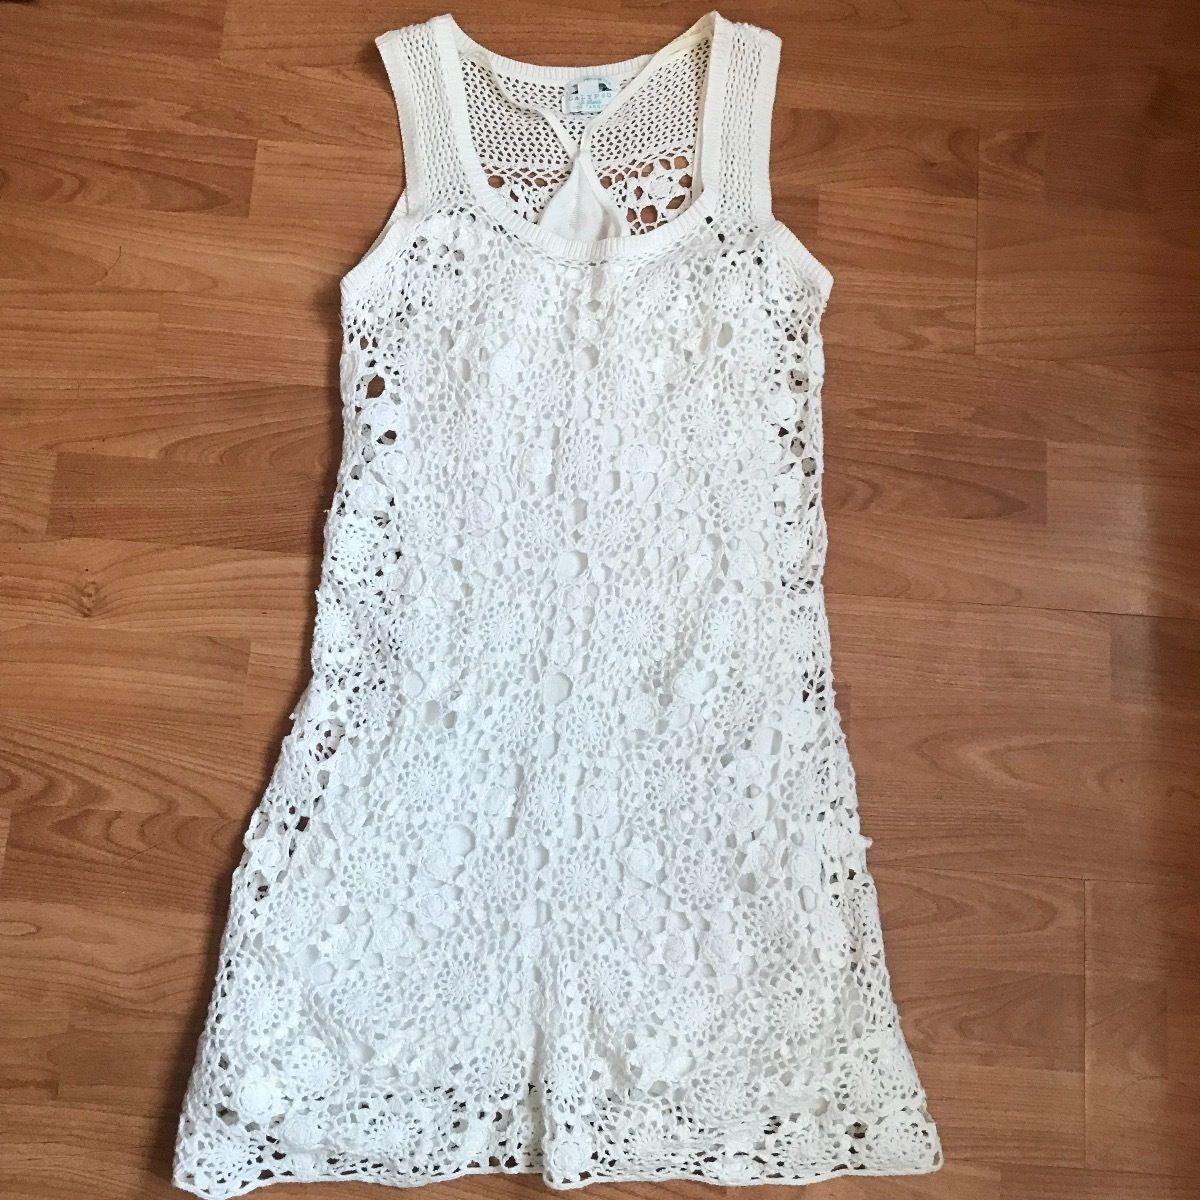 d26814aa7c18 Calypso Vestido De Crochet Blanco Talla Chica 2 Pzas Pareo - $ 290.00